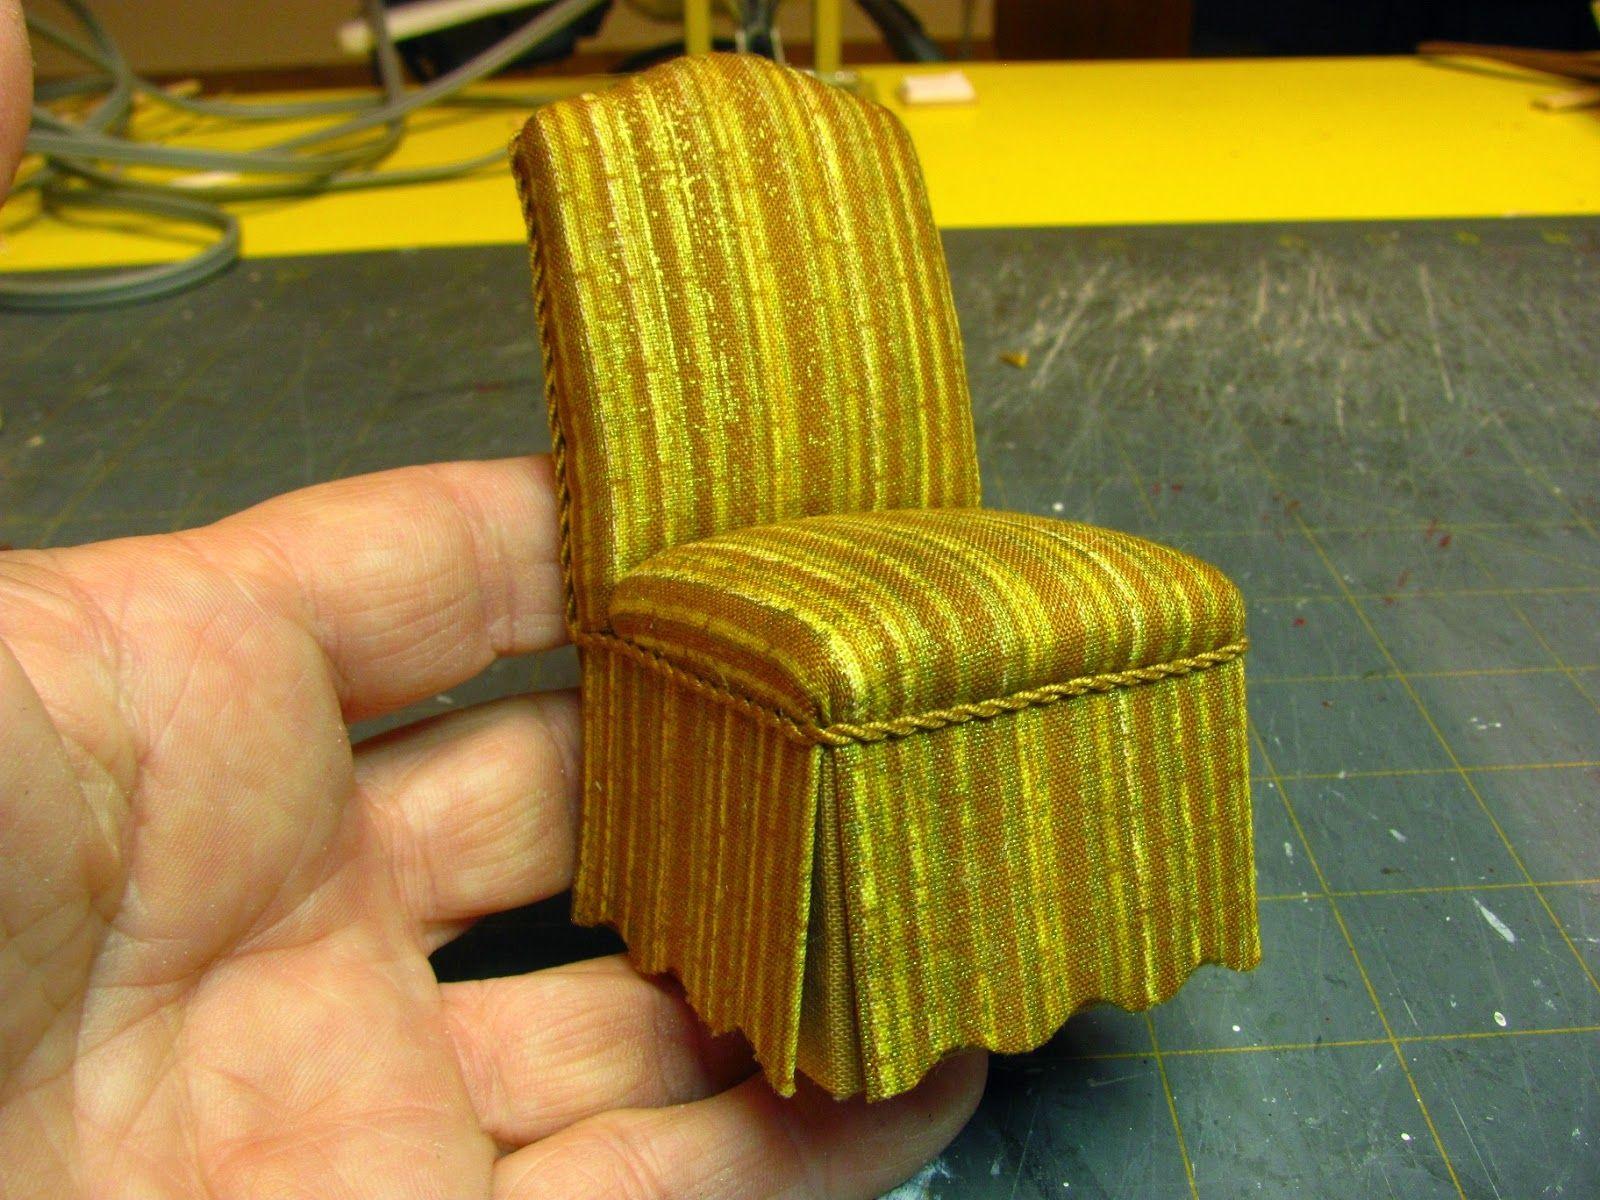 miniature furniture tutorials. a great stepbystep tutorial on how to make miniature parsonu0027s chair dollhouse furniture by 1 inch minis tutorials